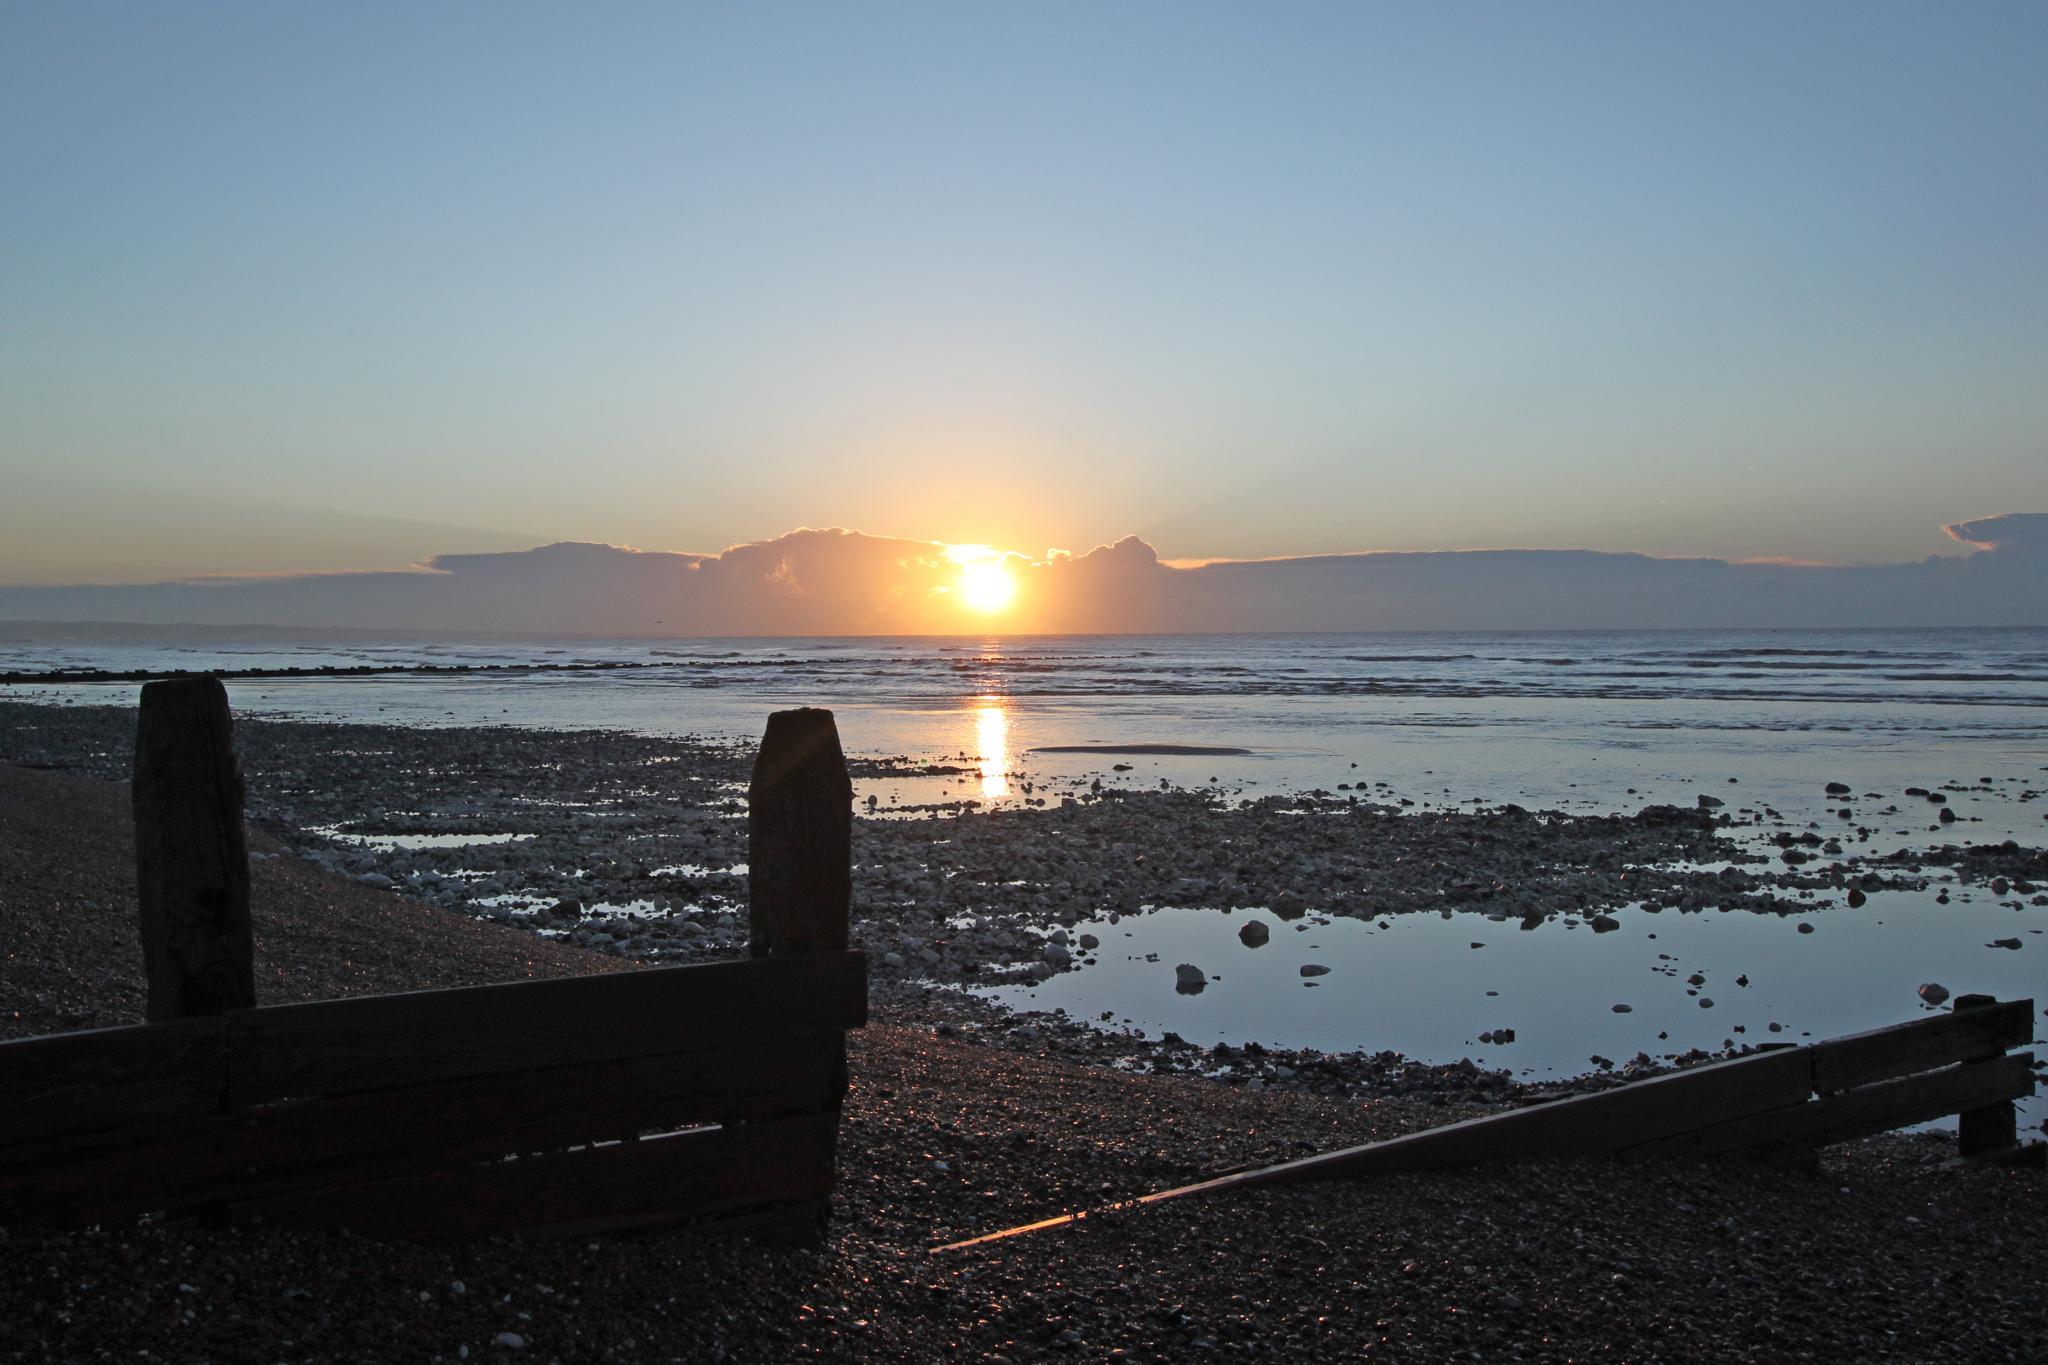 Sunrise by chris.stubbings.52